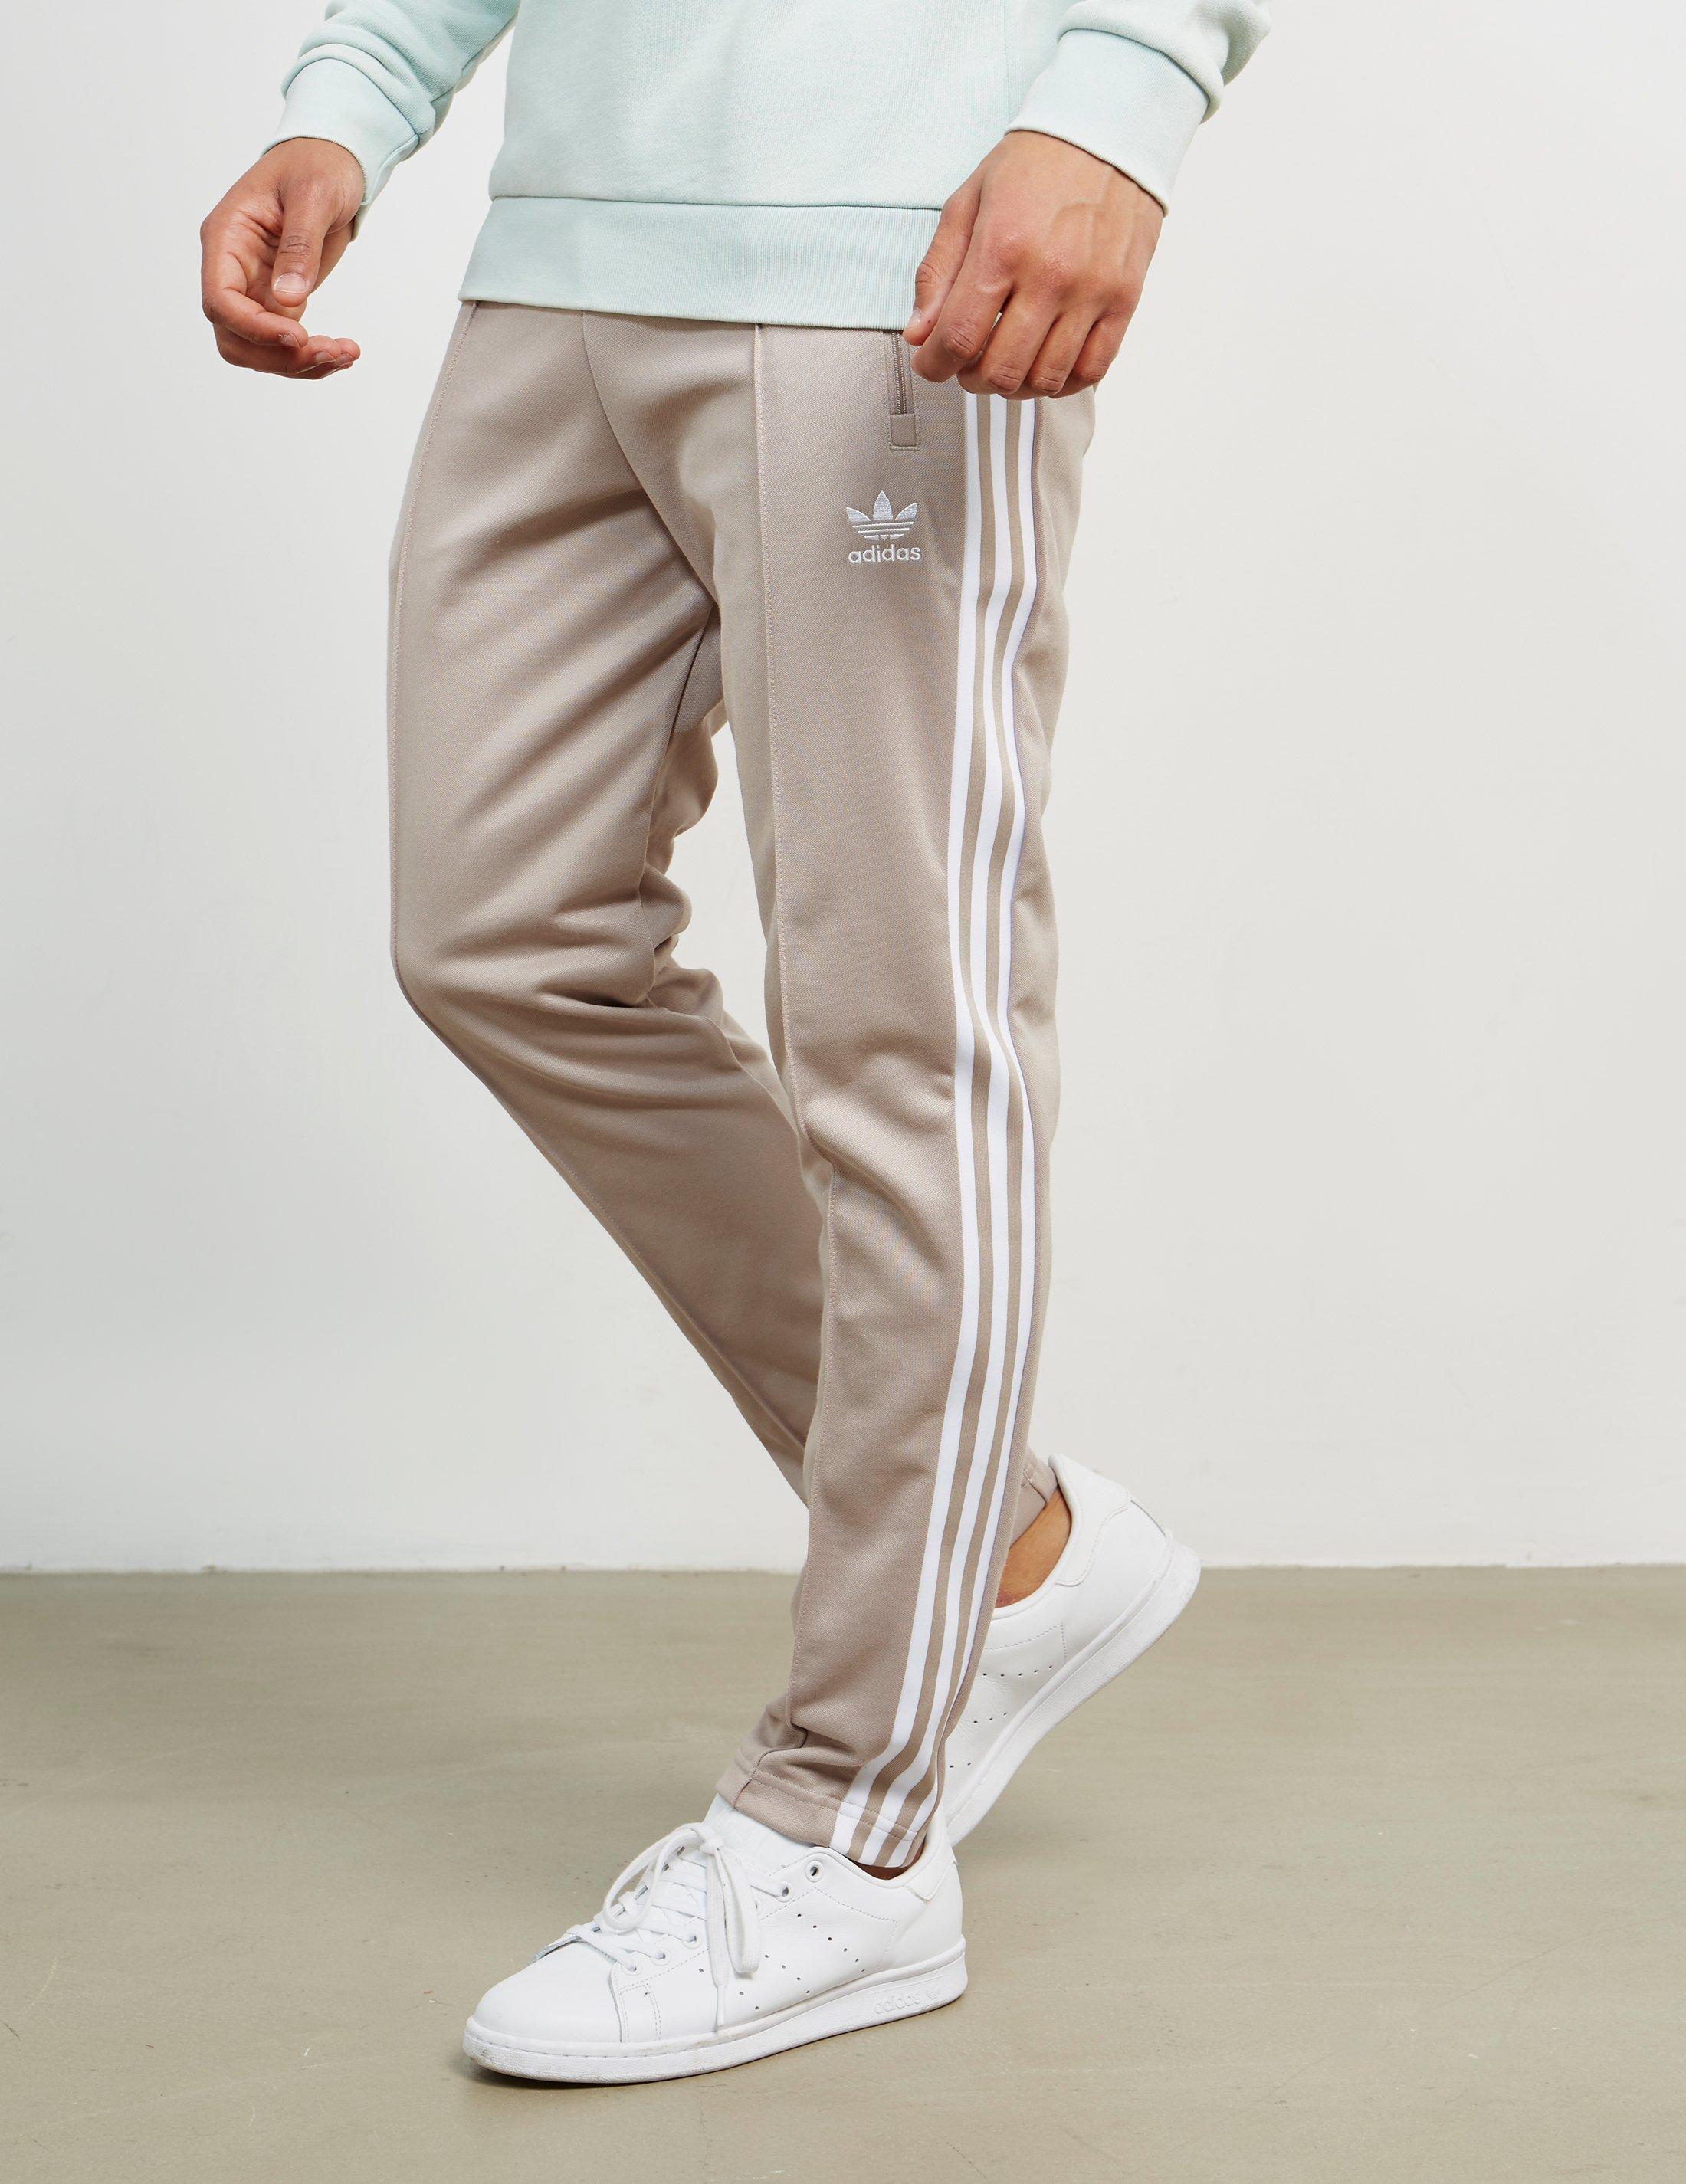 5b0420e1854 adidas Originals Mens Beckenbauer Cuffed Track Pants Grey in Gray ...